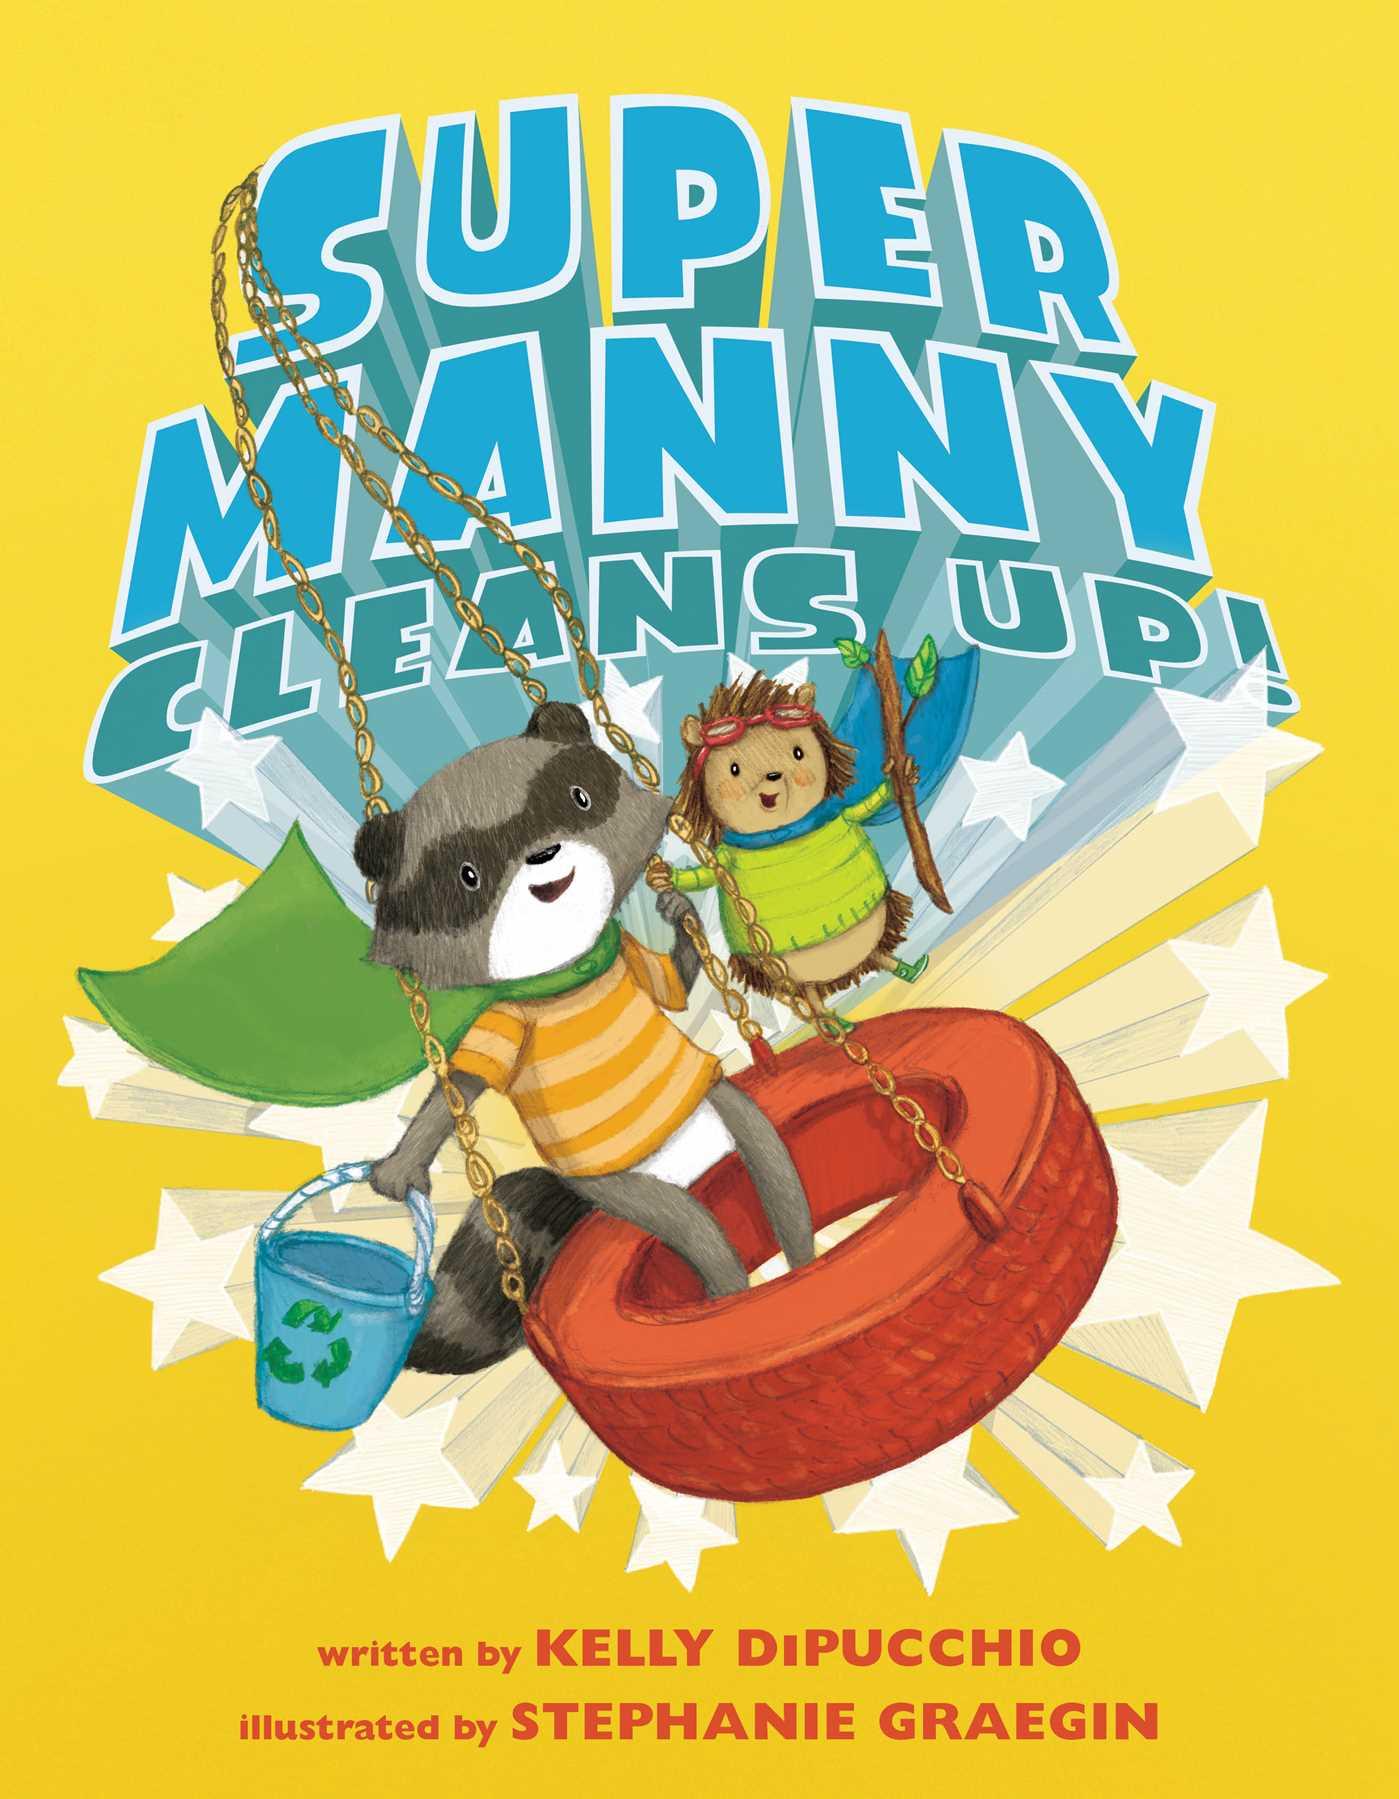 Super manny cleans up 9781481459624 hr